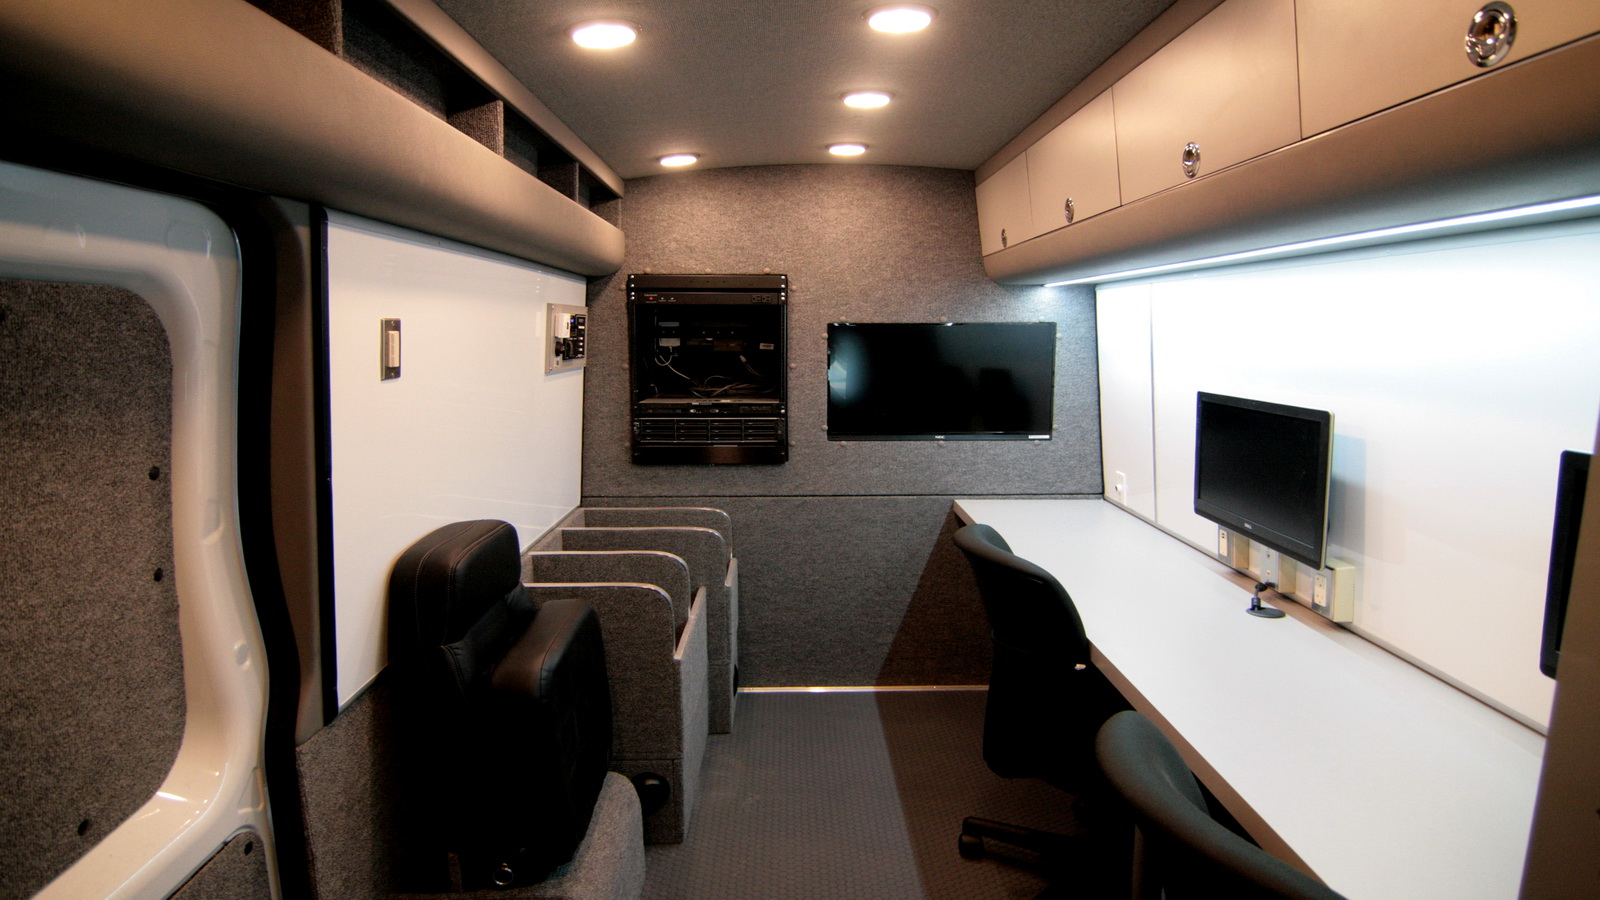 Work Vans For Sale >> Mobile Command Center Conversions Vans | Commercial Vehicles | HQ Custom Design